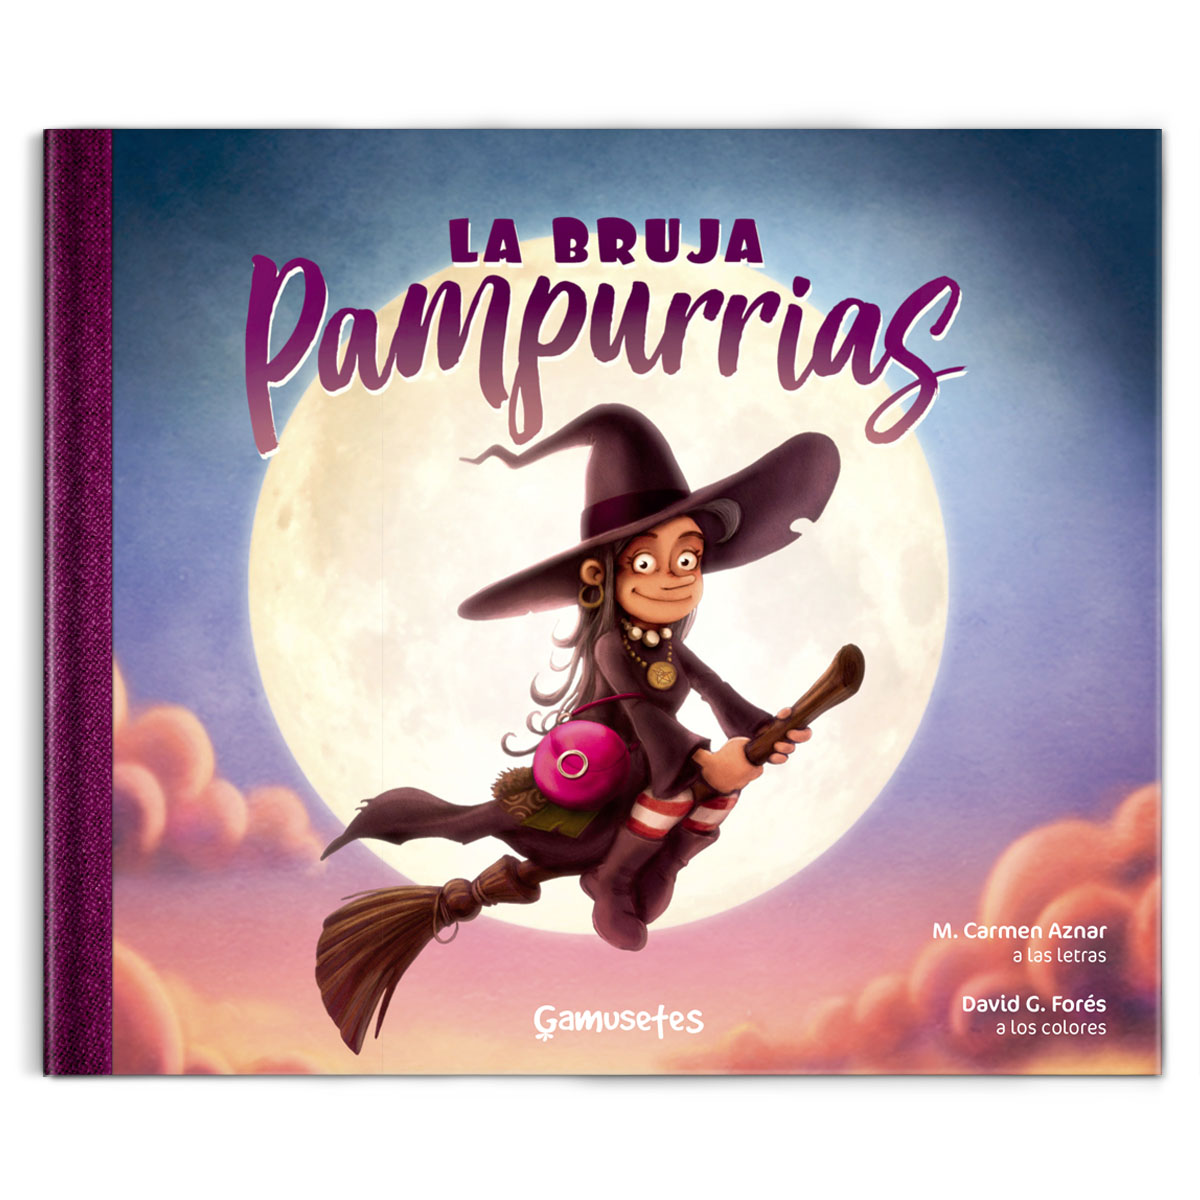 la bruja Pampurrias  libro infantil ilustrado primaria